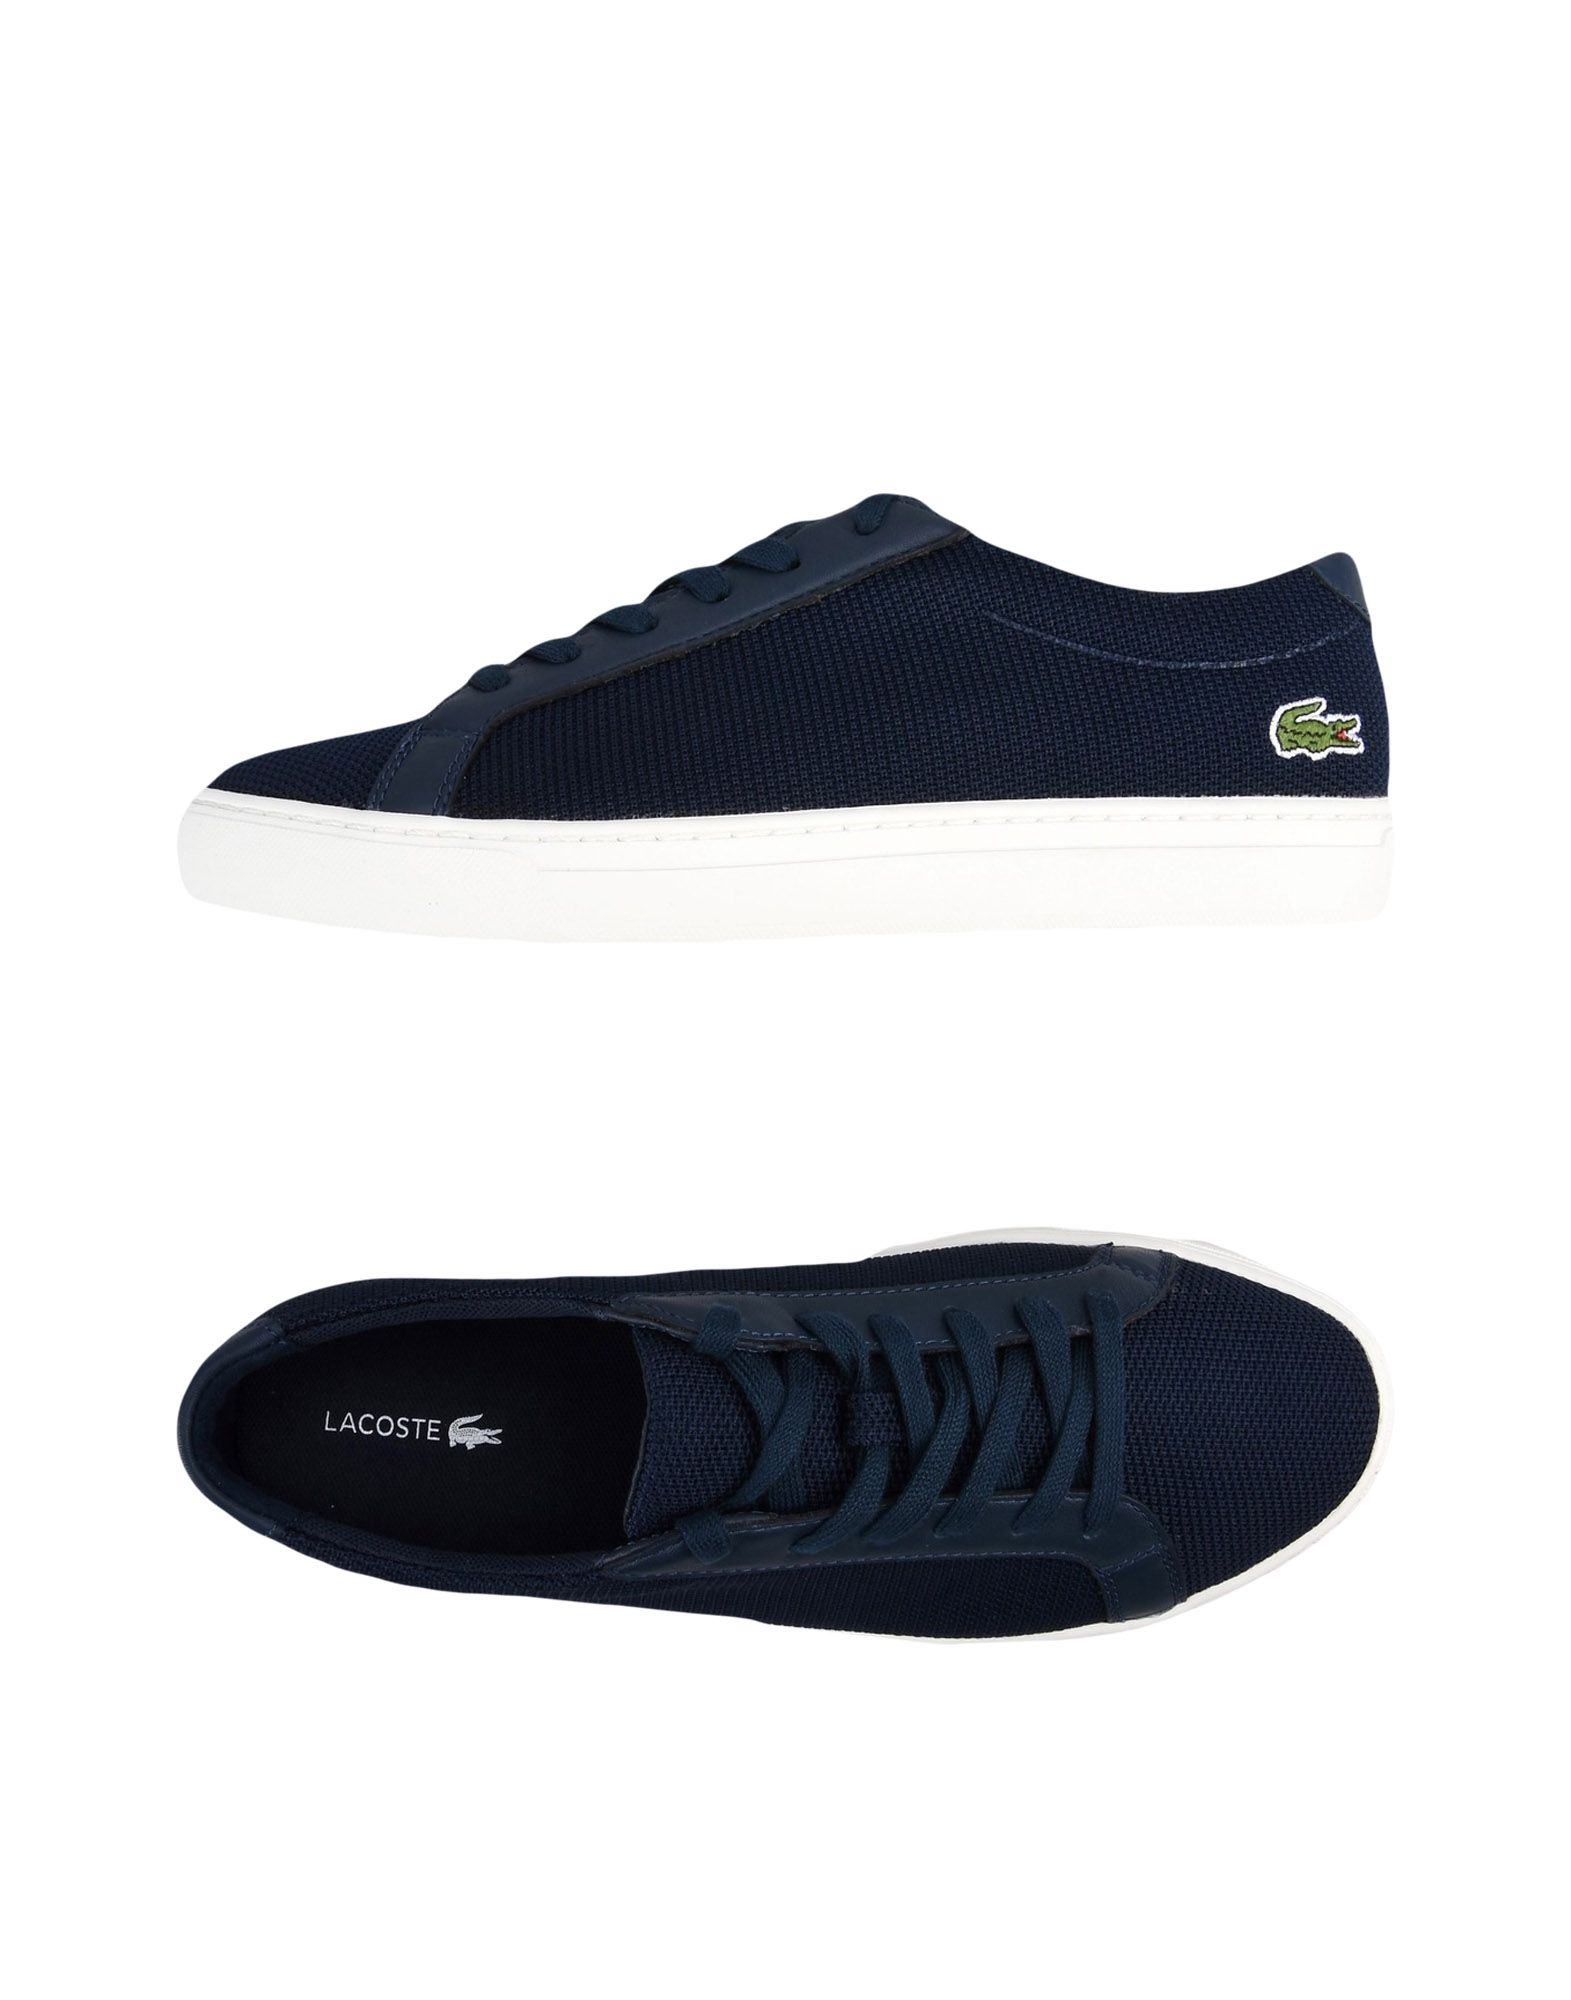 Sneakers Lacoste L.12.12 117 2 Mis. 2-5,5 - Donna - 11211115DF